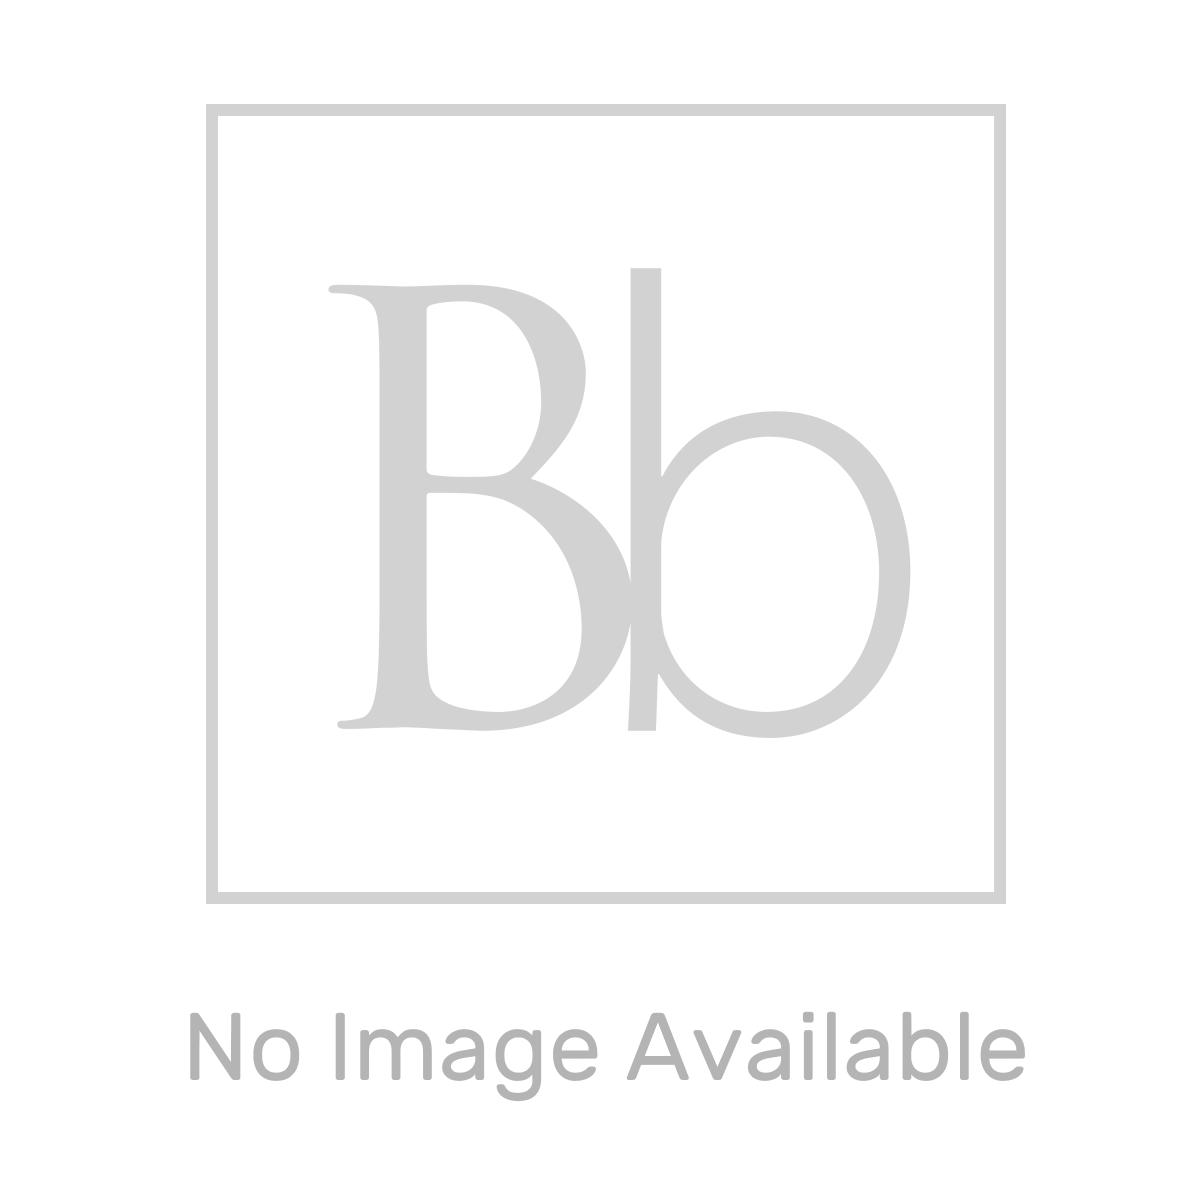 RAK Moon Black Shower Bath Mixer Tap Measurements